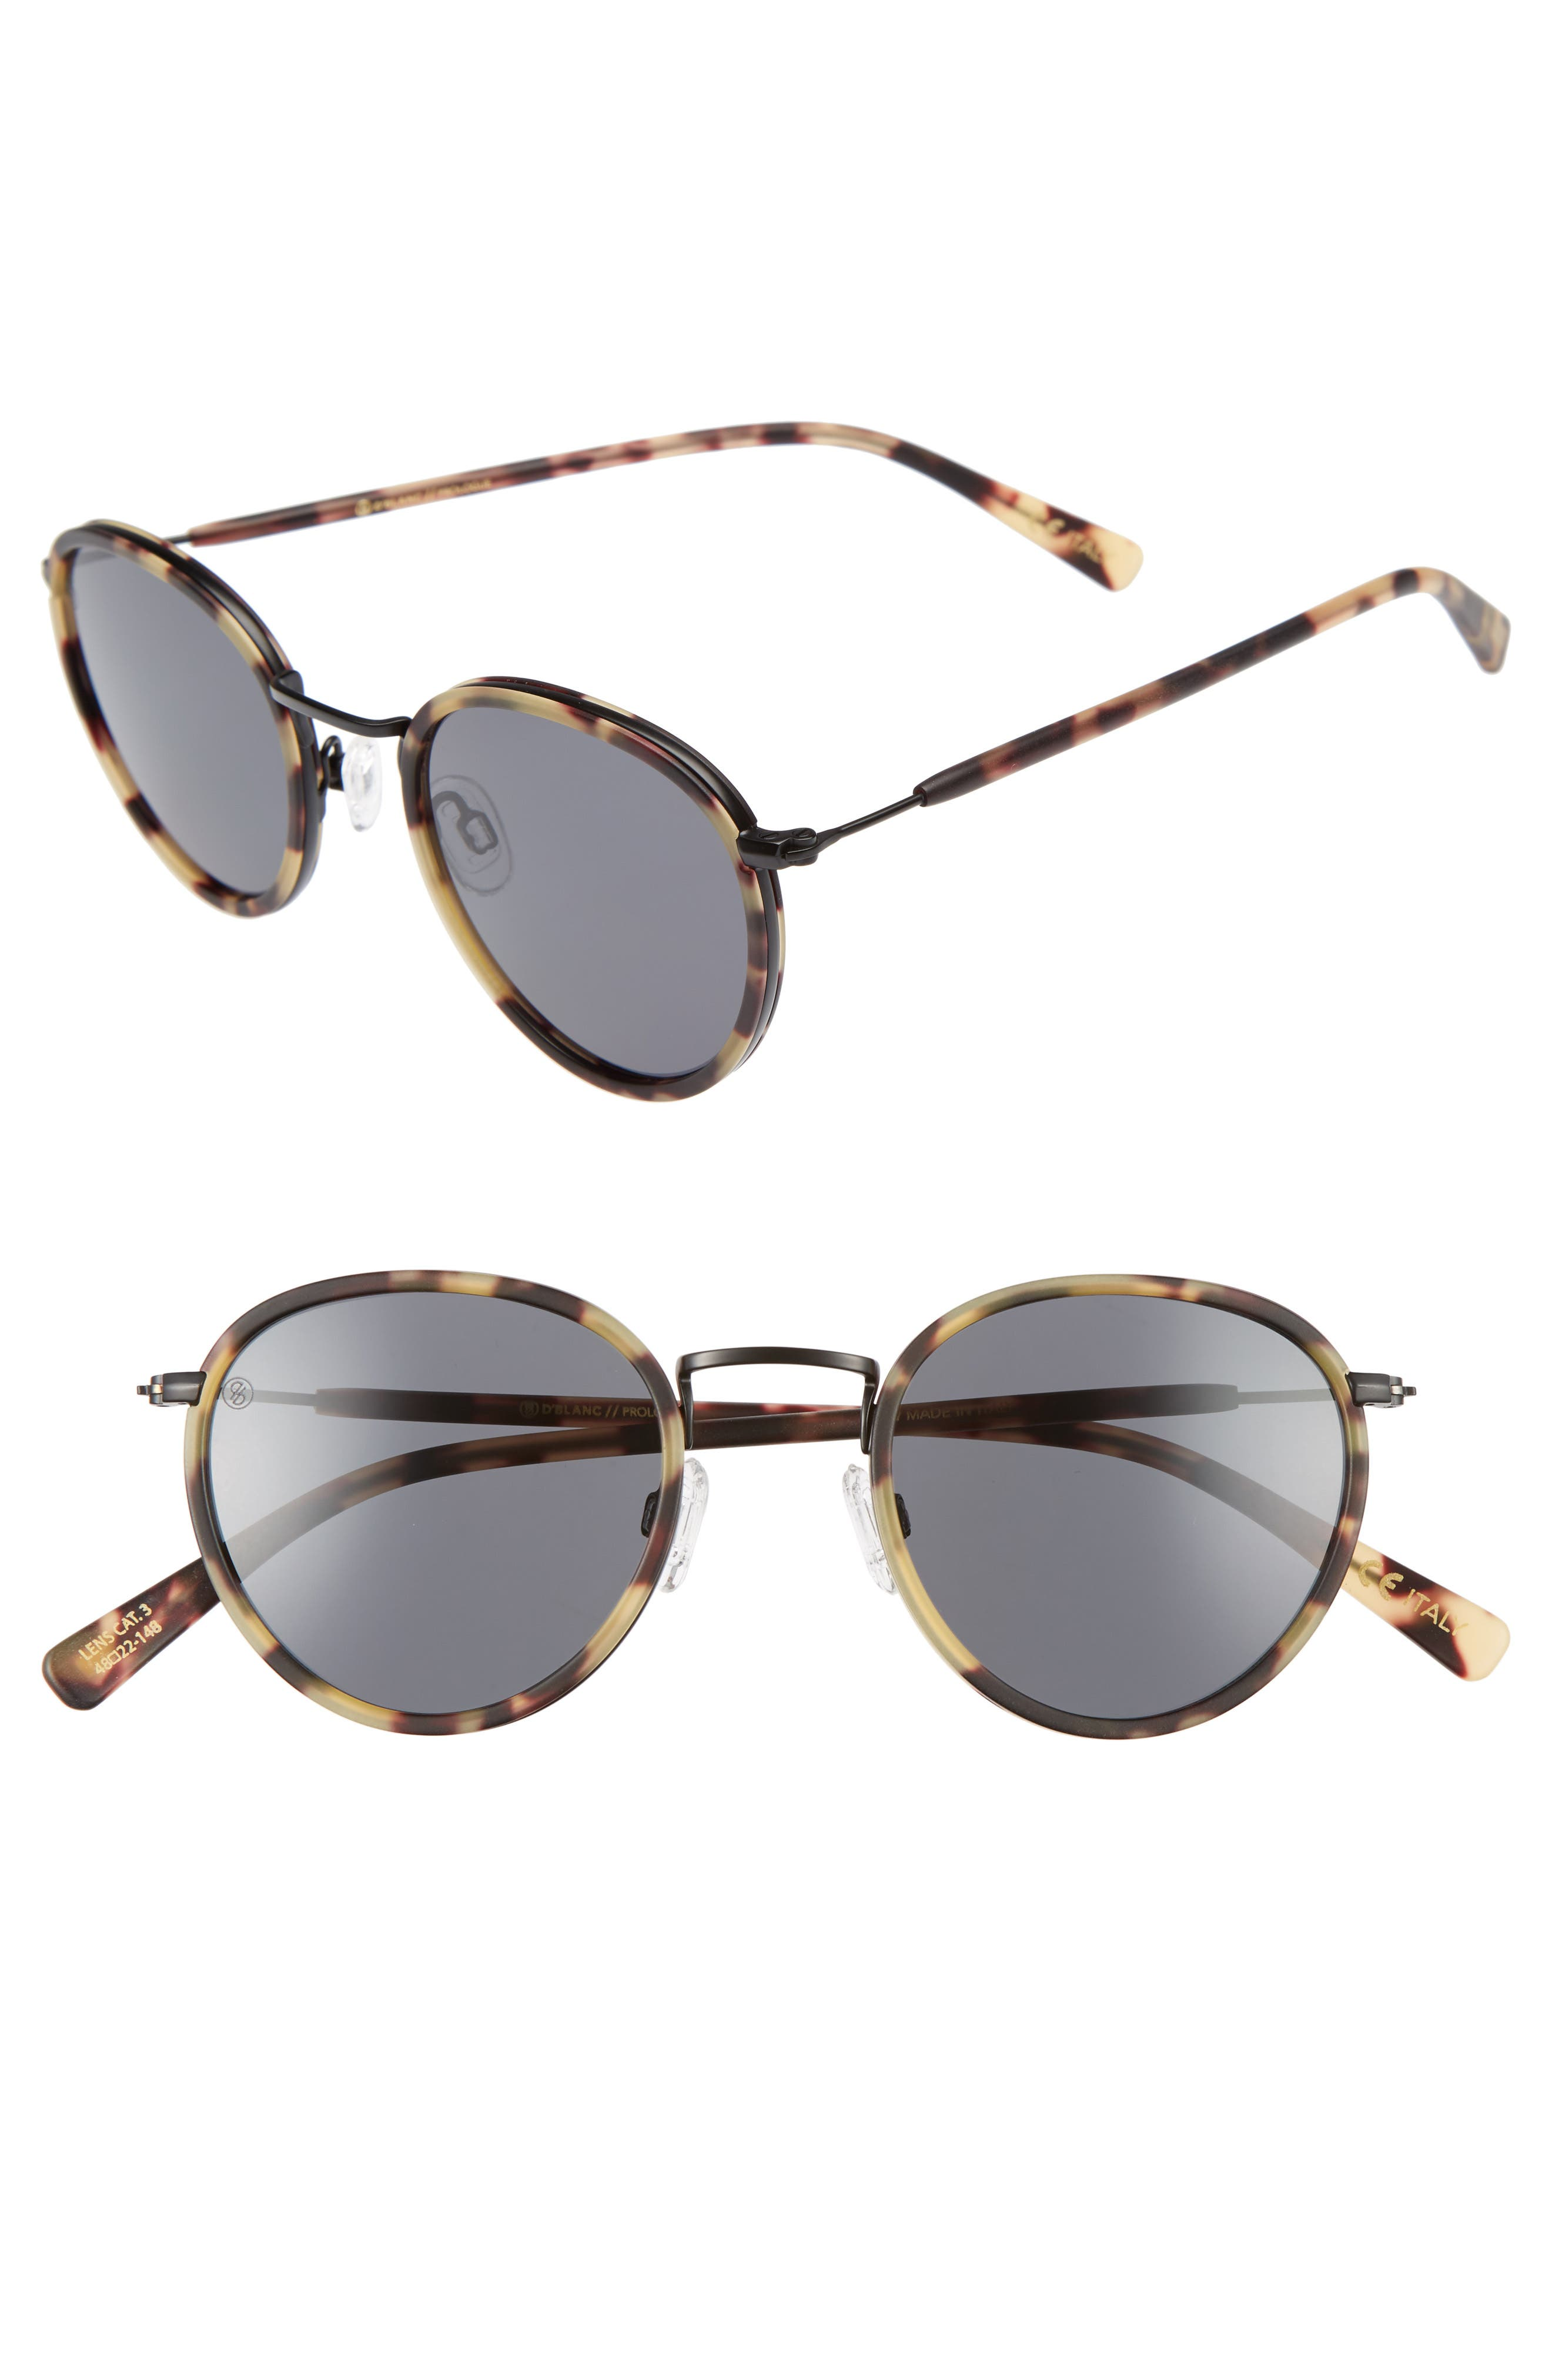 DBLANC DBLANC Prologue 48mm Round Sunglasses